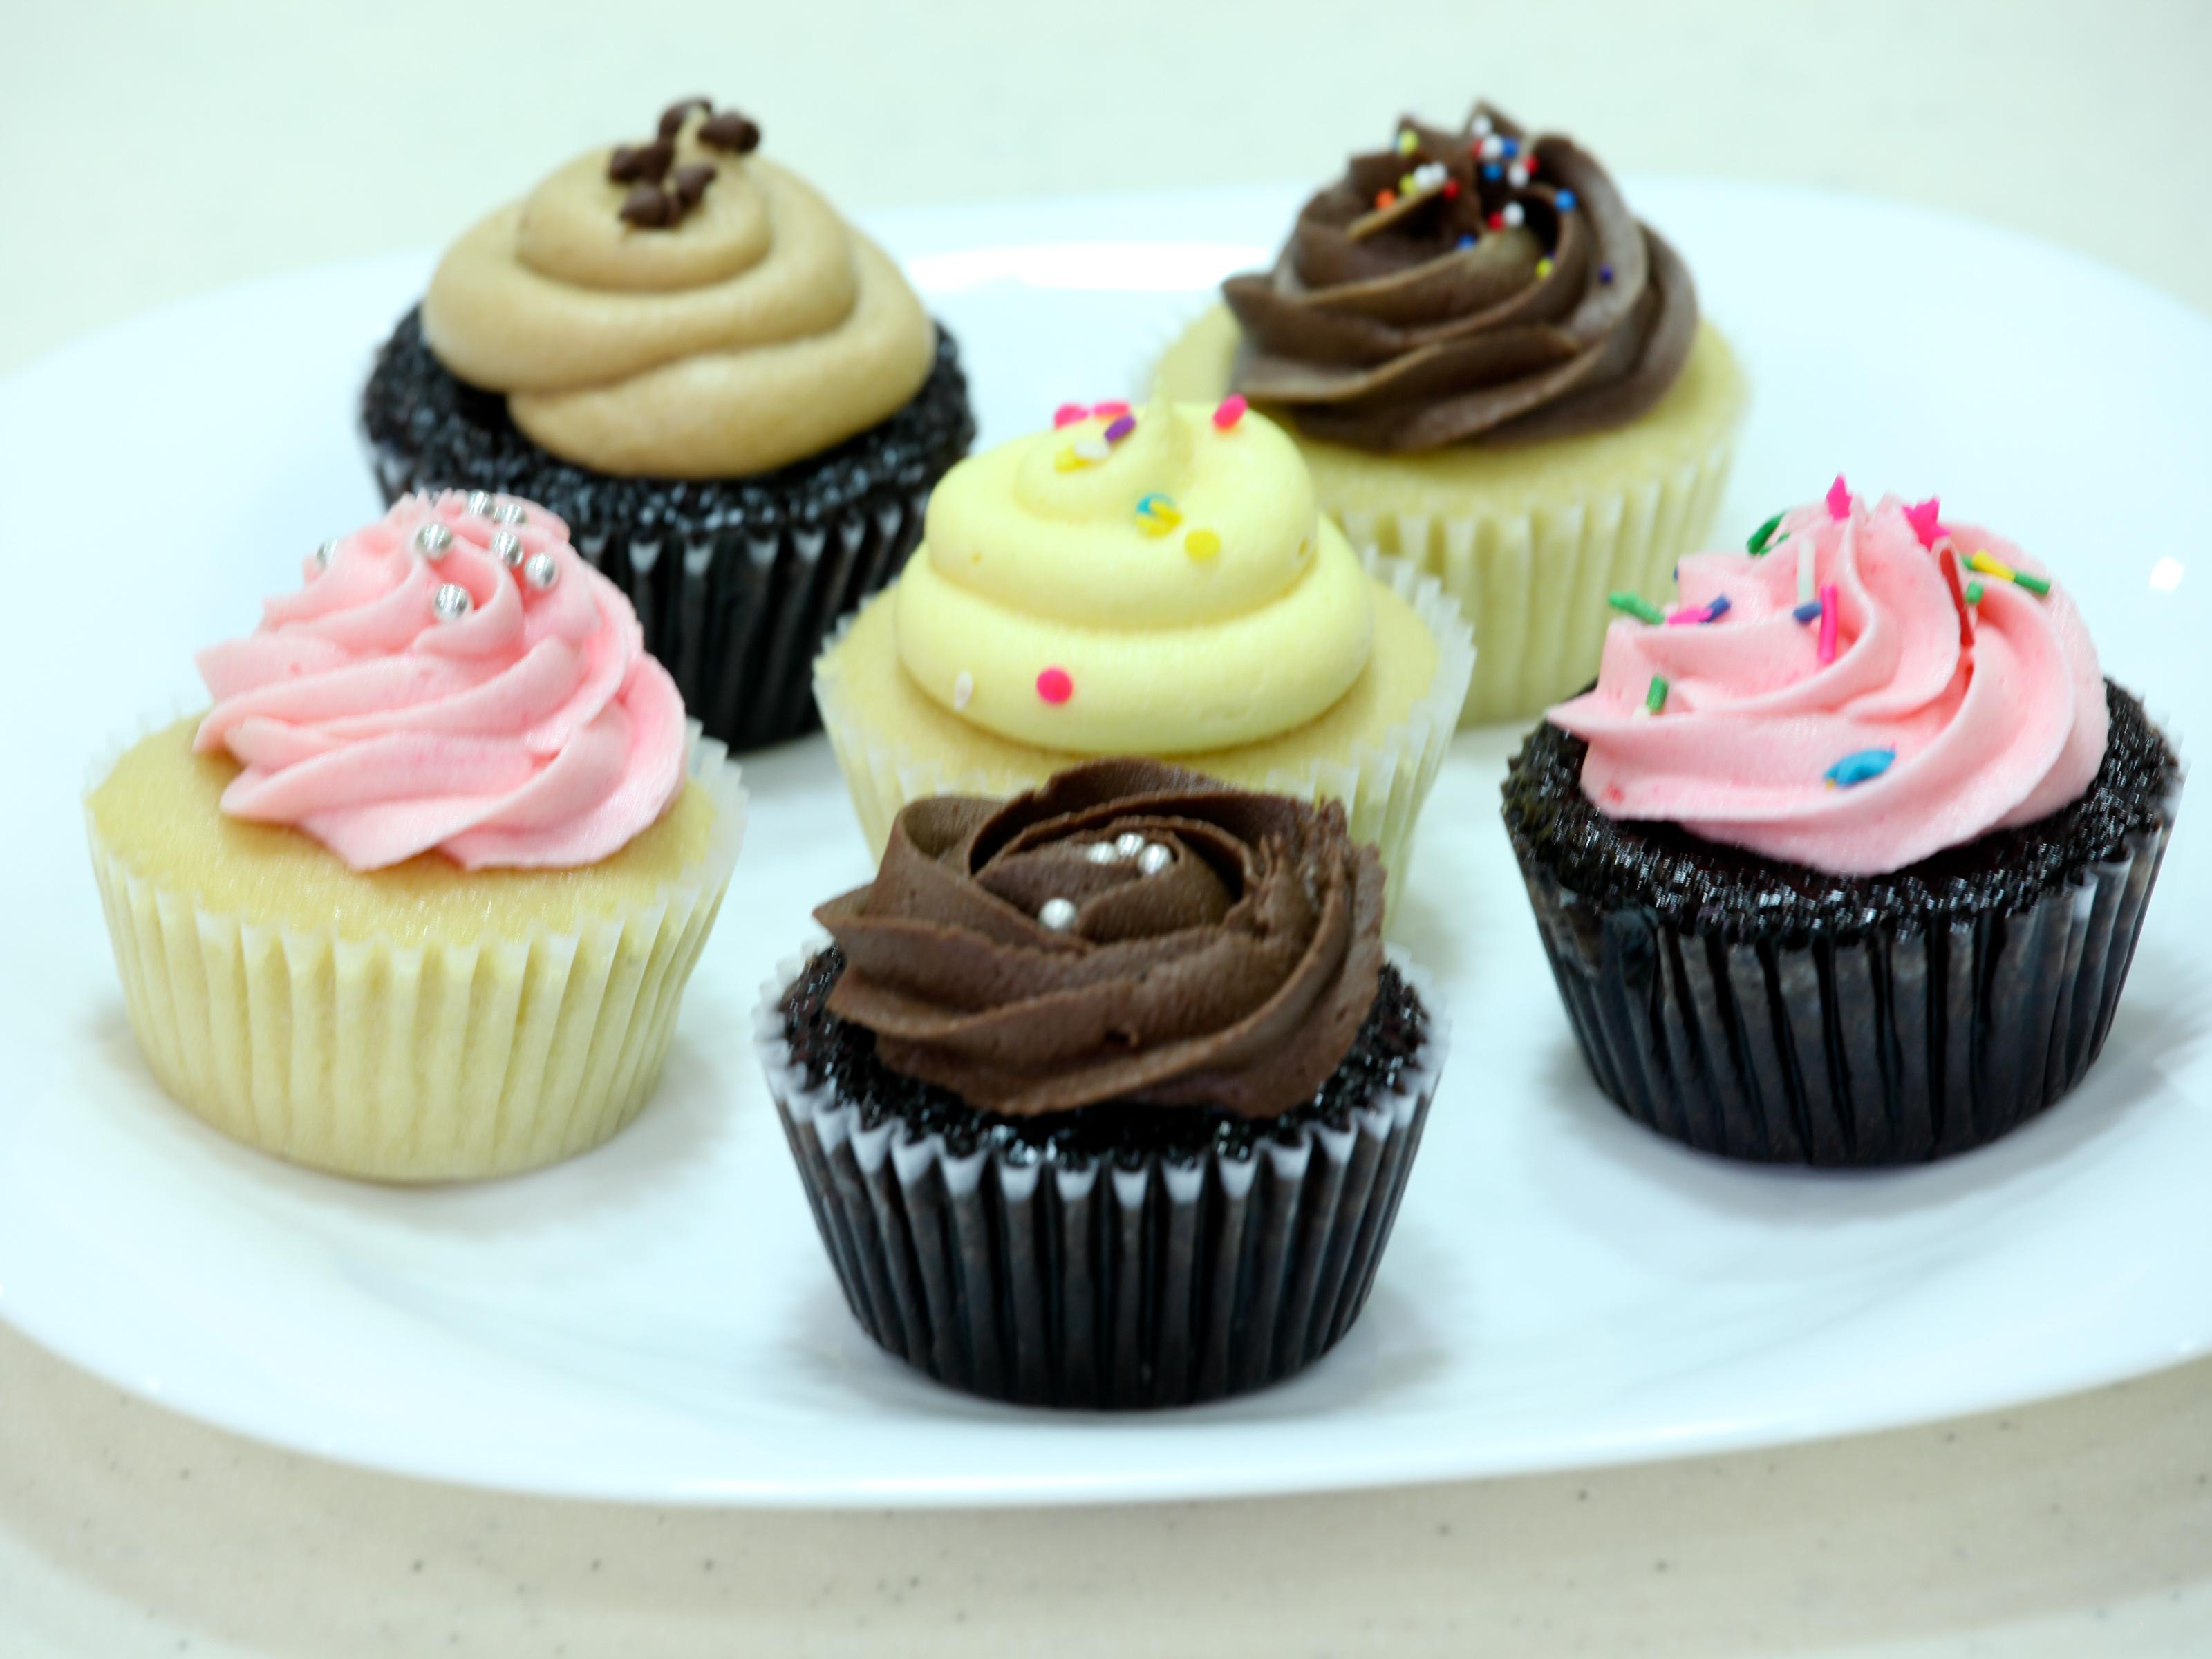 6 Ways To Eat A Cupcake